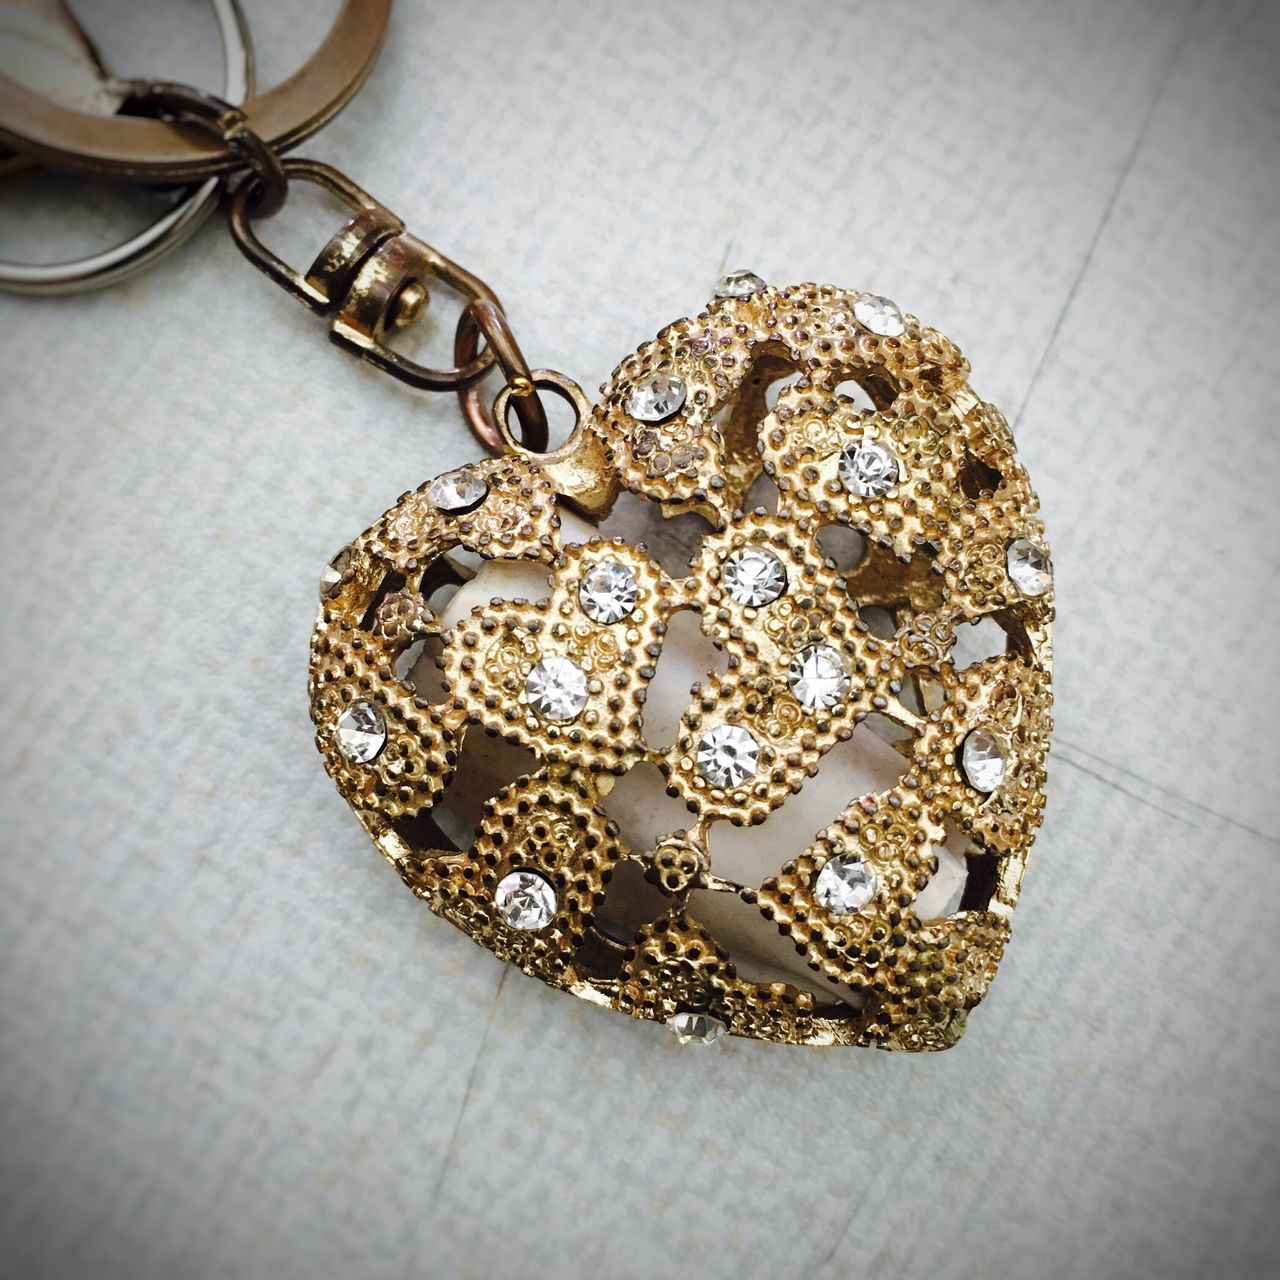 43 Golden Moments Gold Heart Key Chain Heart Of Gold